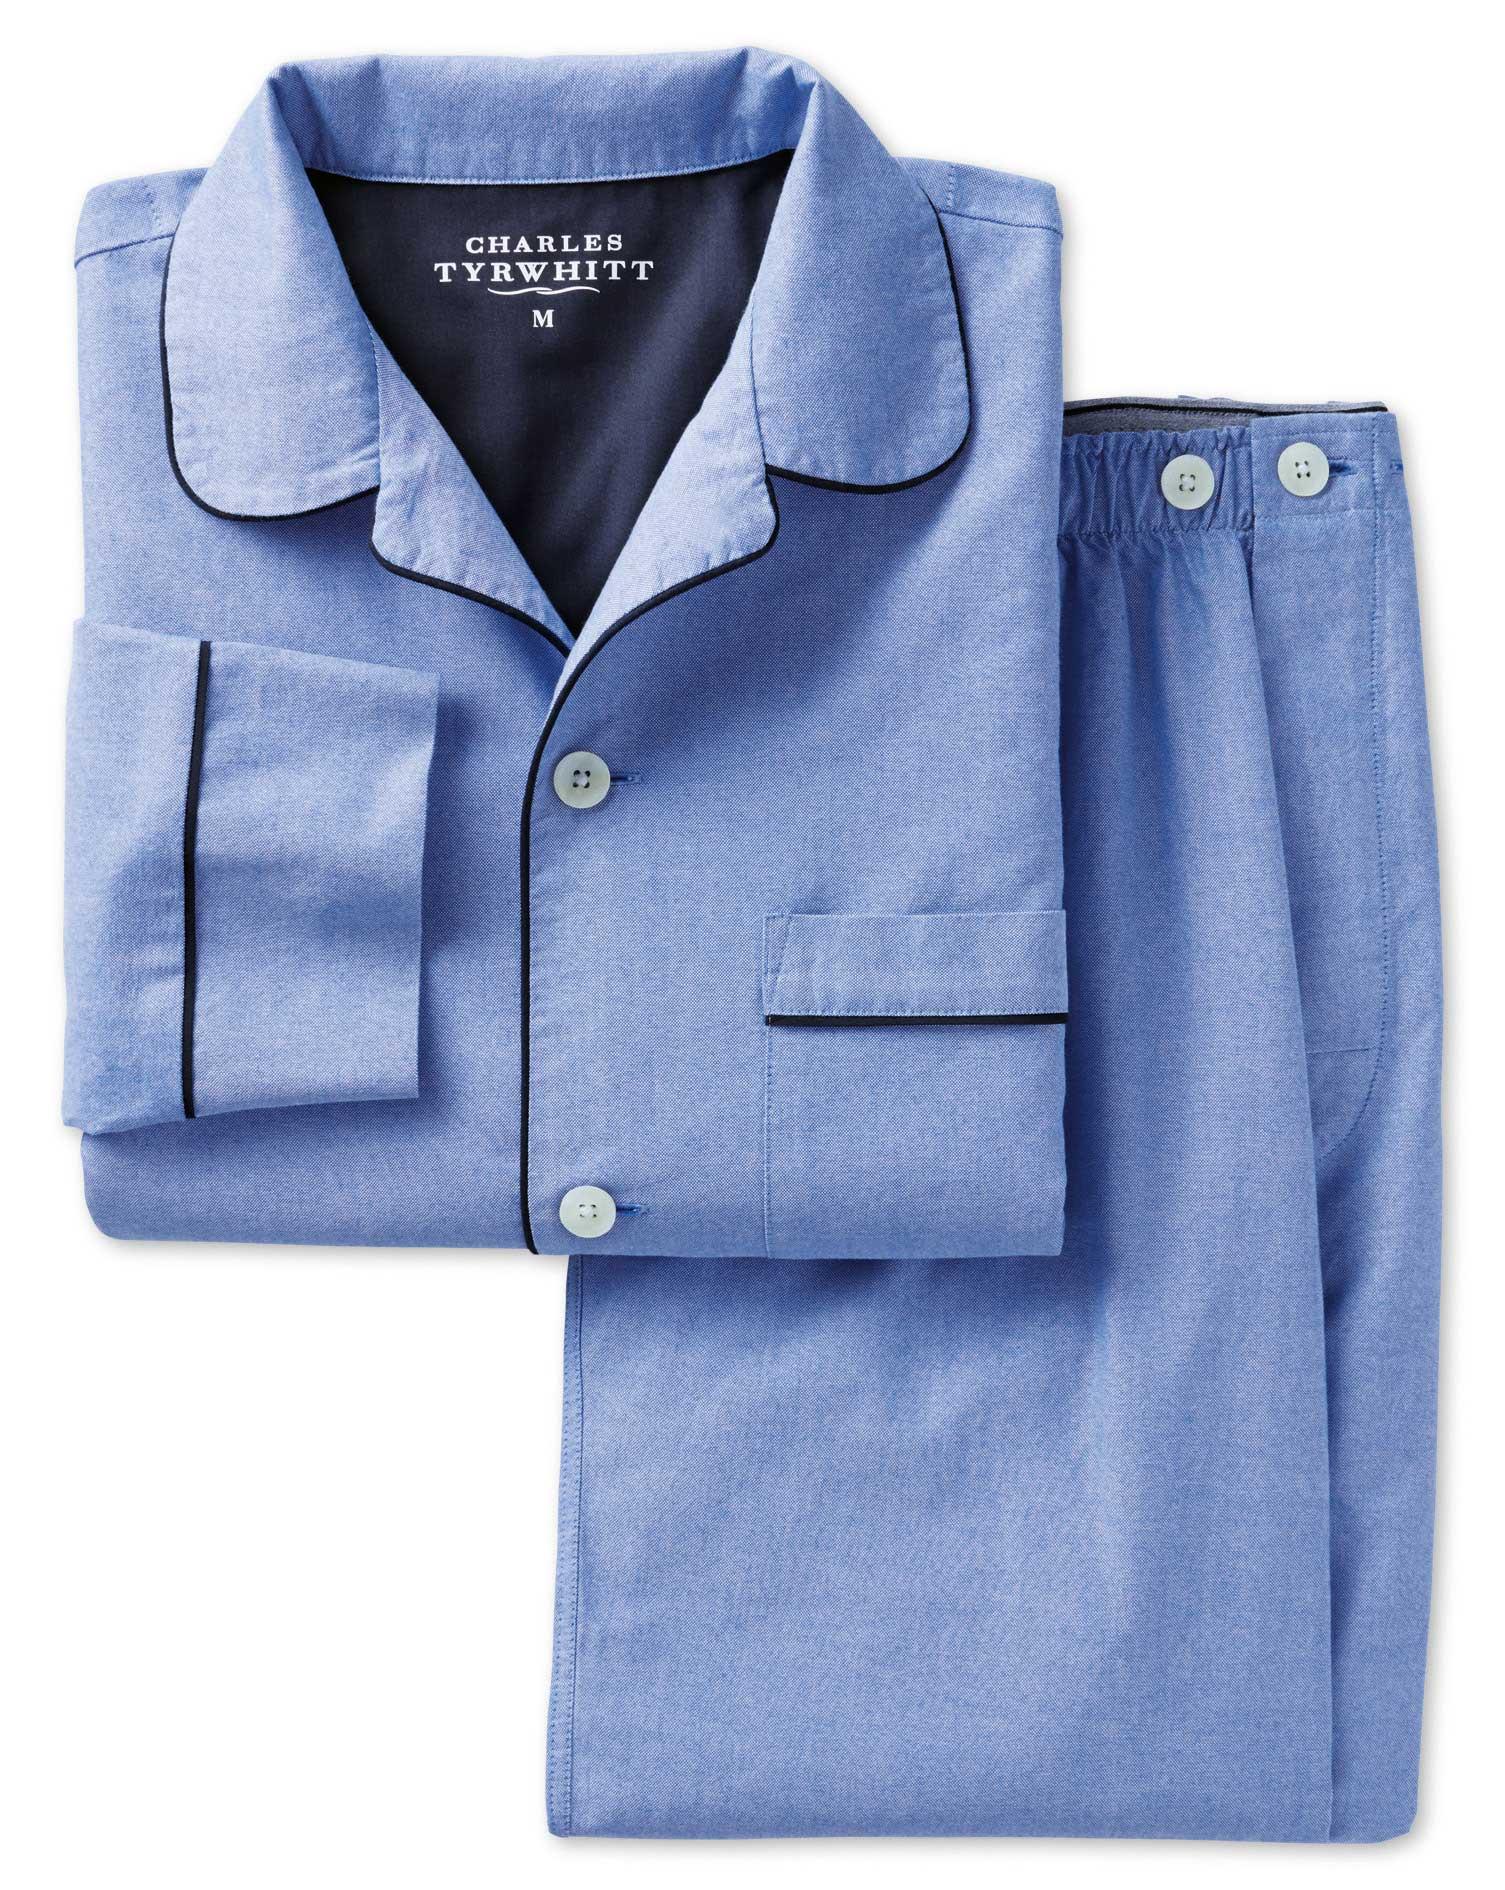 Sky Cotton Pyjama Set Size Medium by Charles Tyrwhitt